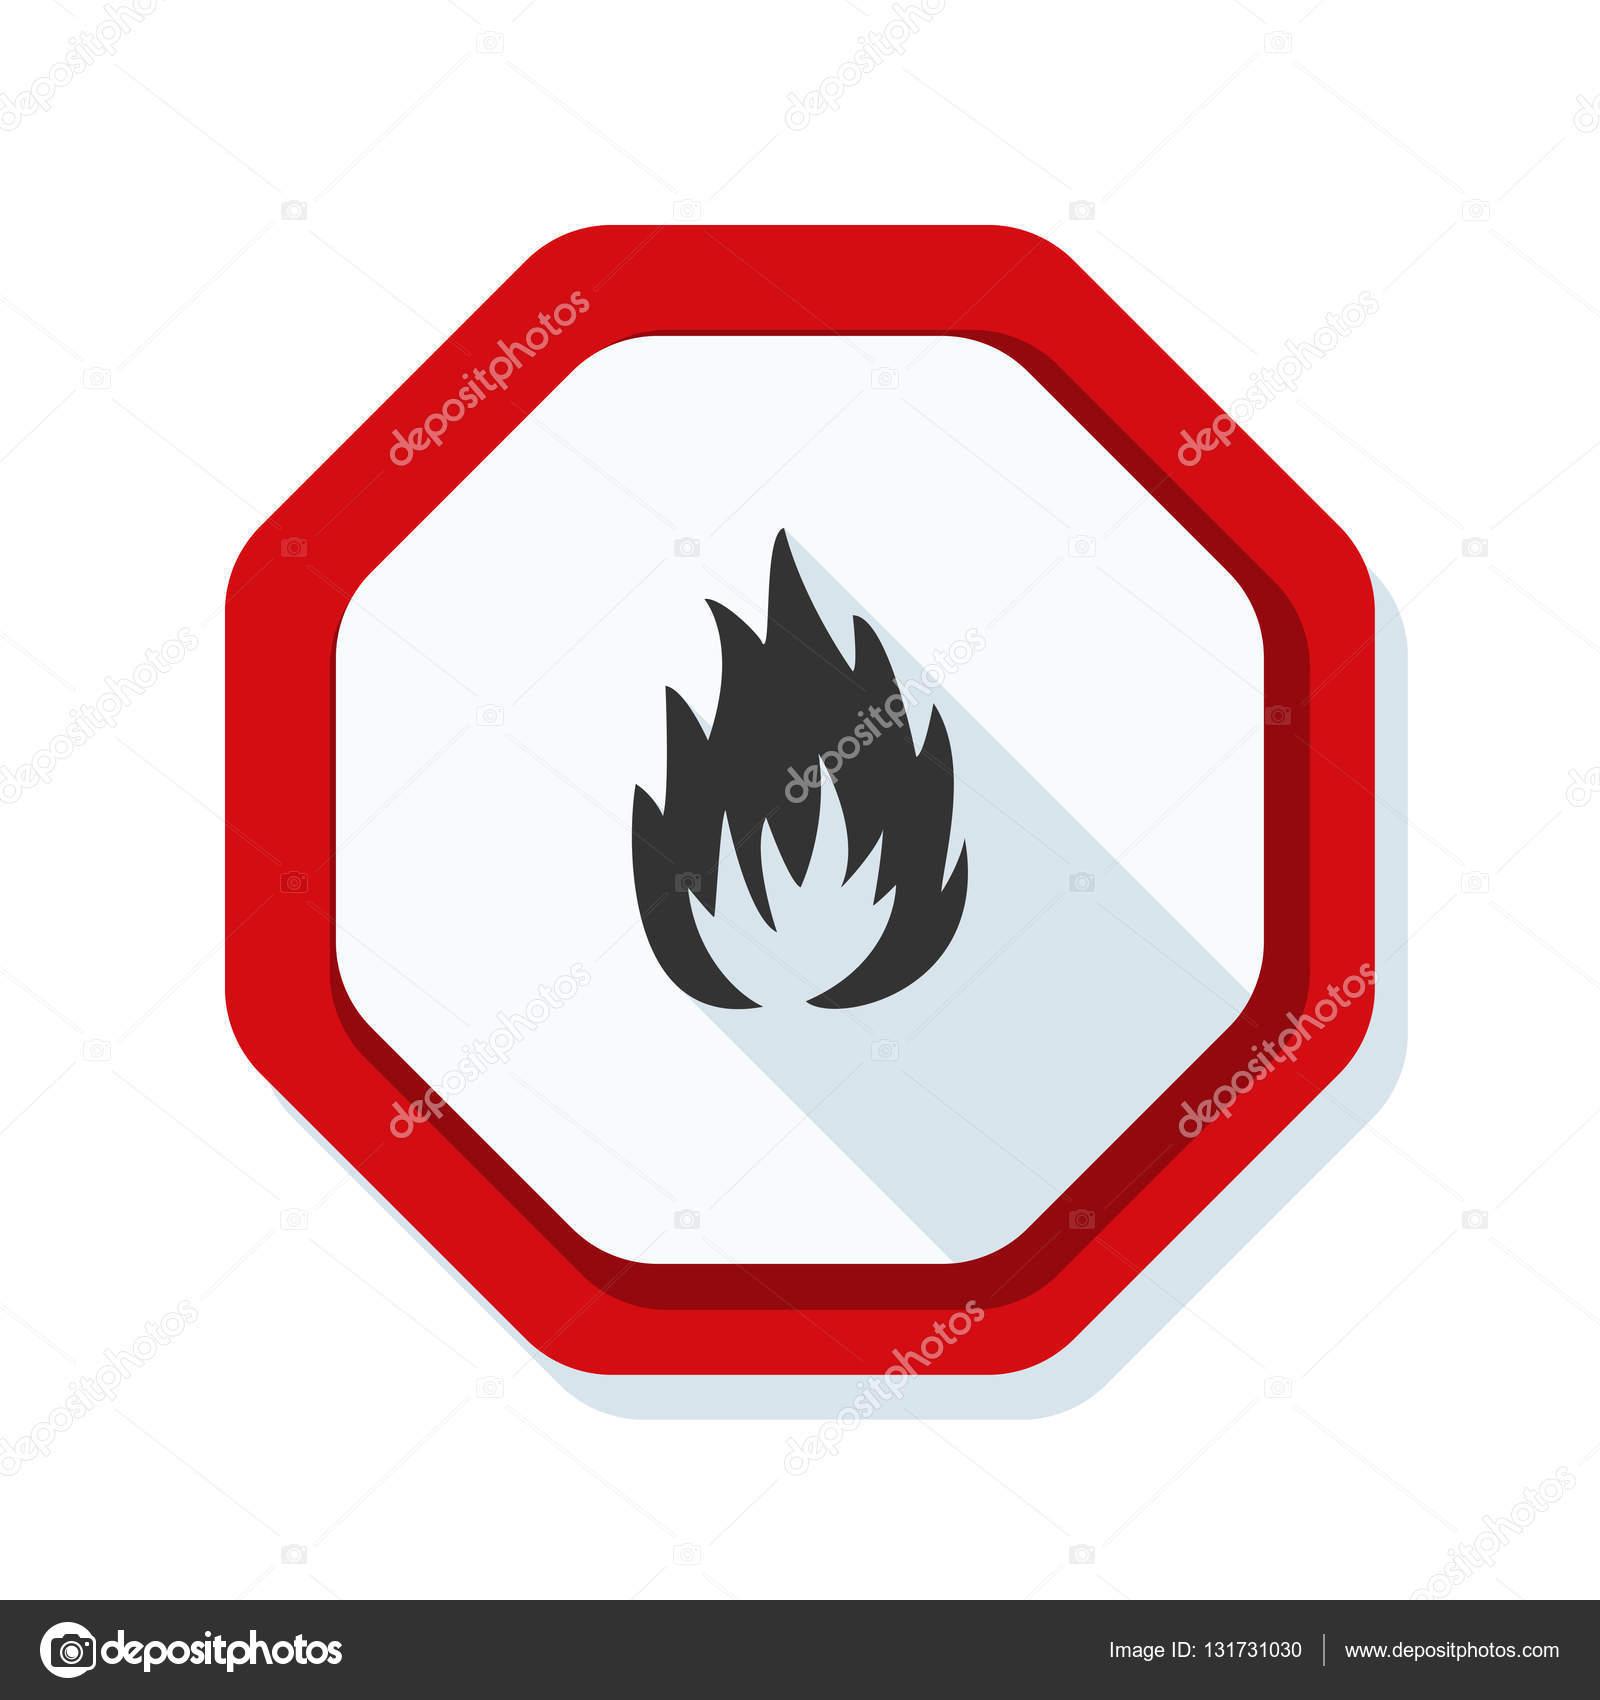 Flammable danger sign stock vector yuriyvlasenko 131731030 flammable danger sign stock vector buycottarizona